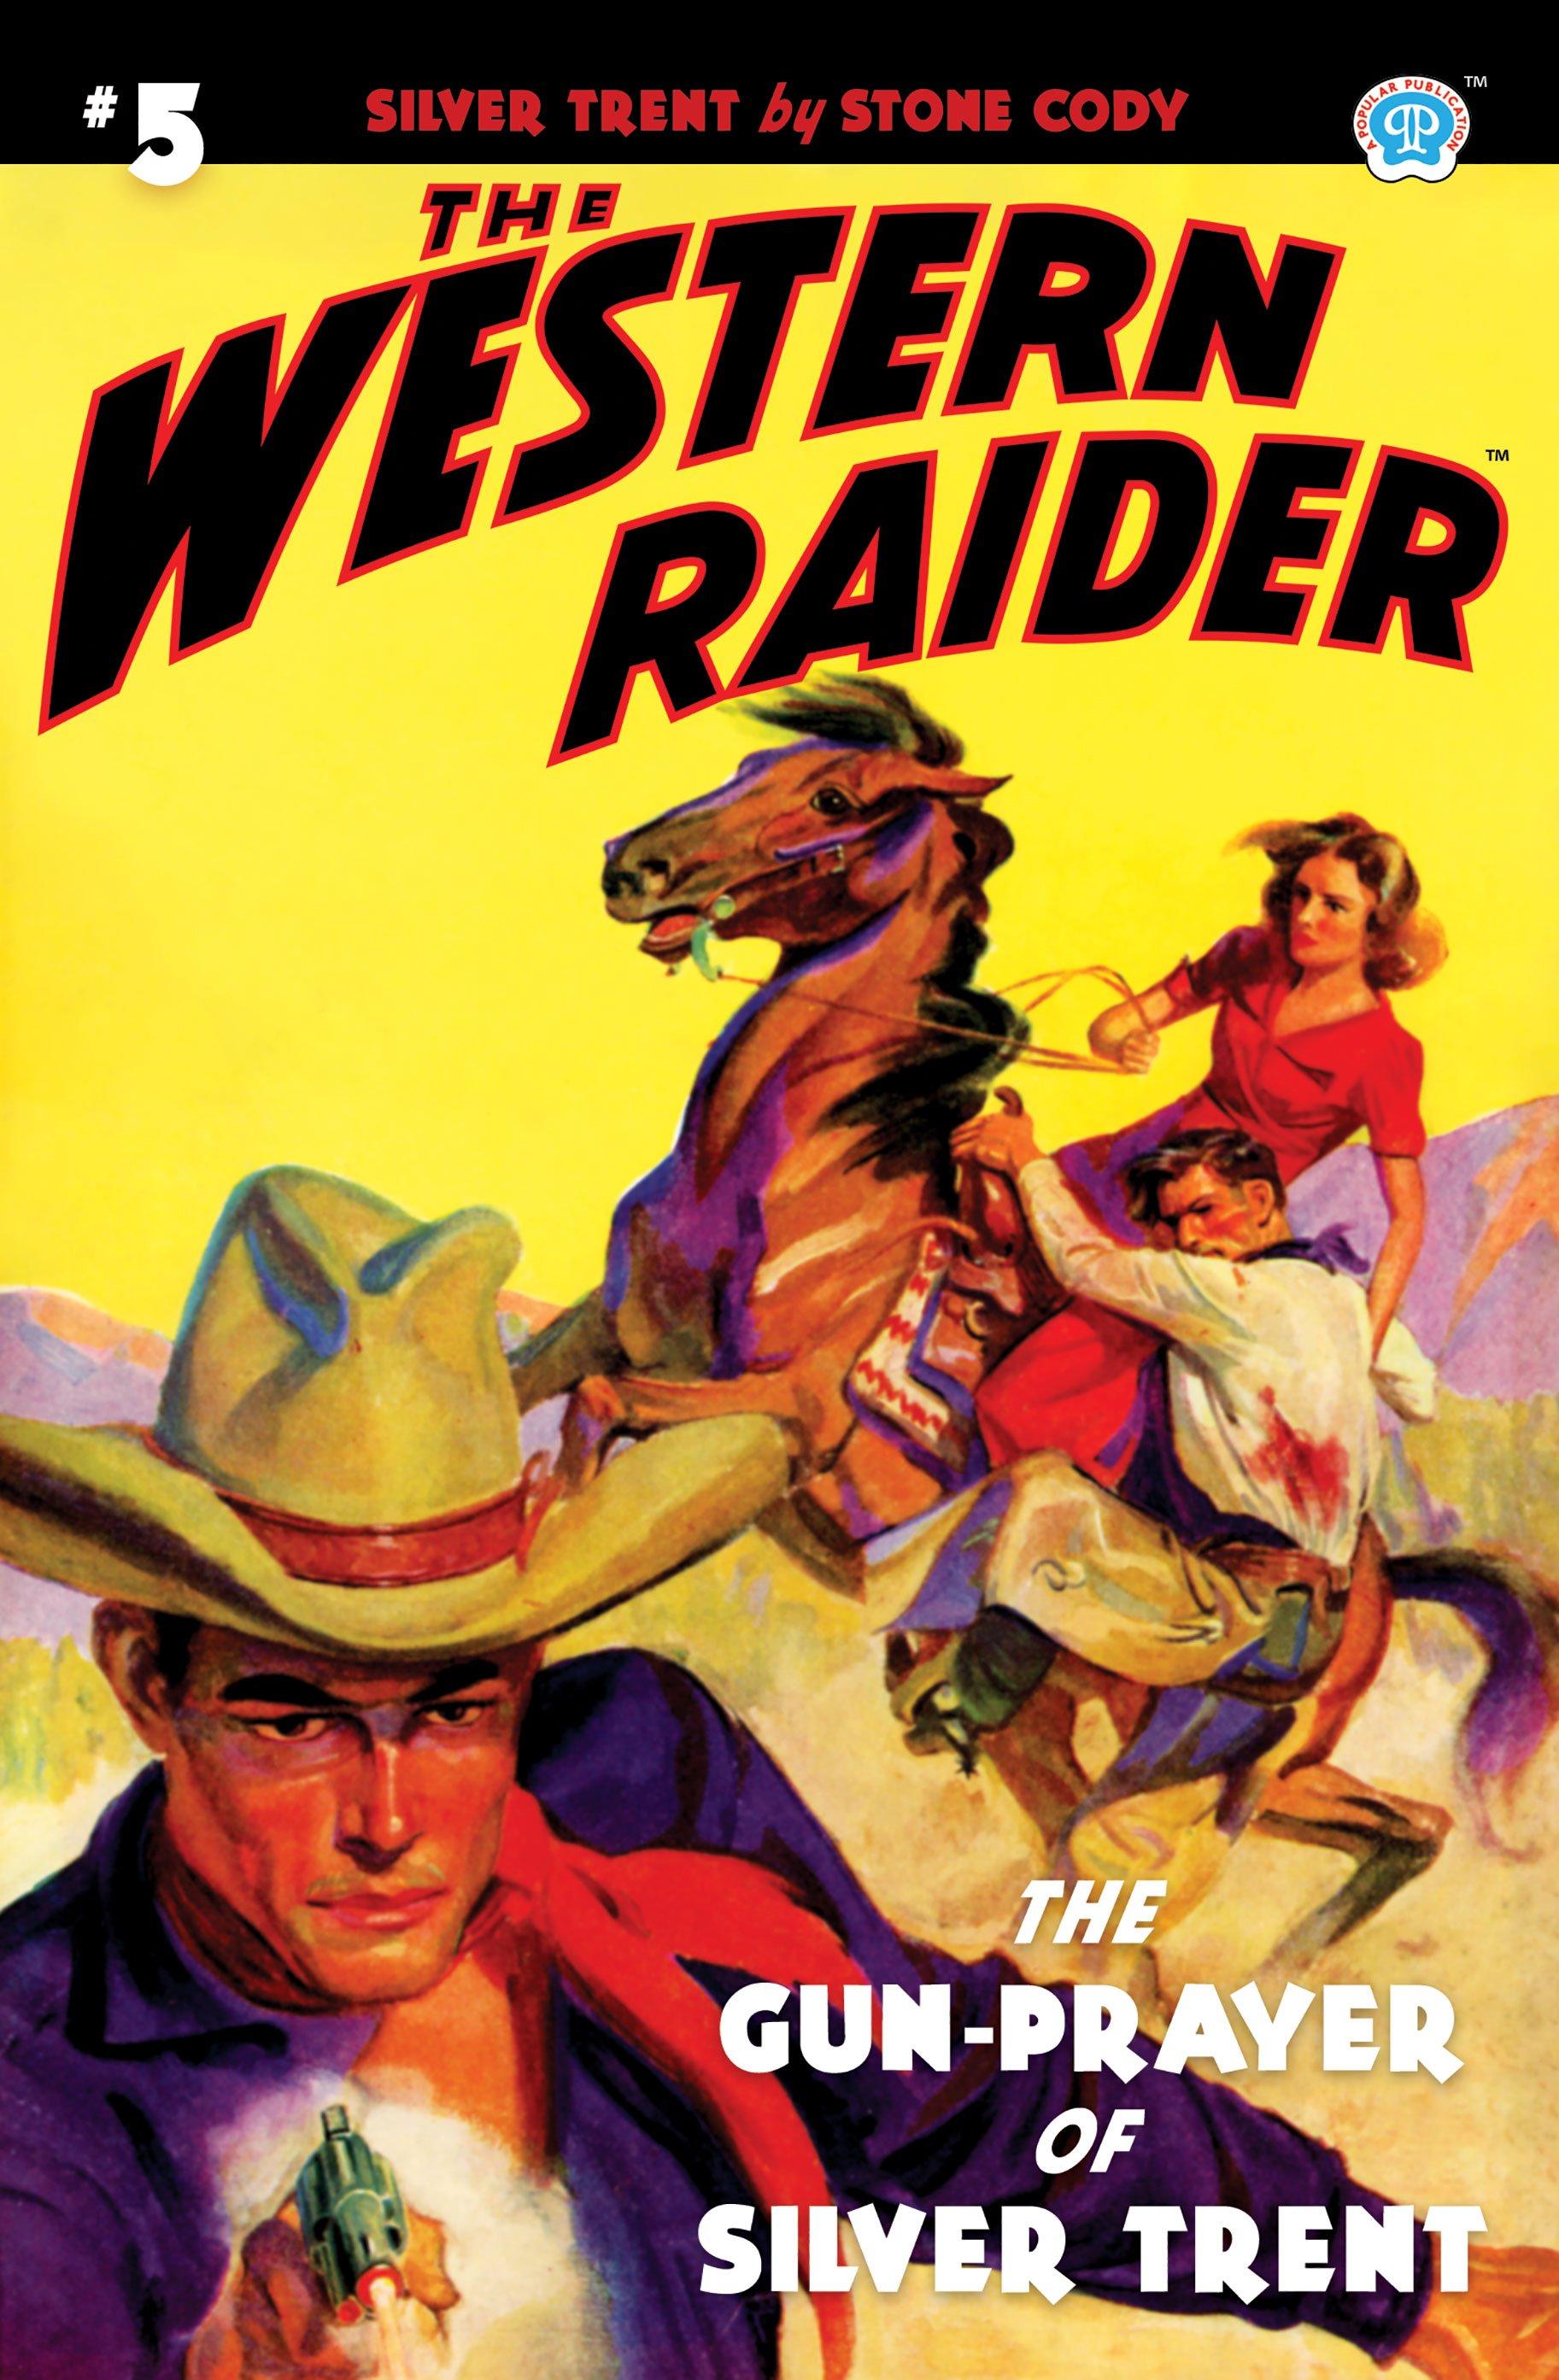 The Western Raider #5: The Gun-Prayer of Silver Trent